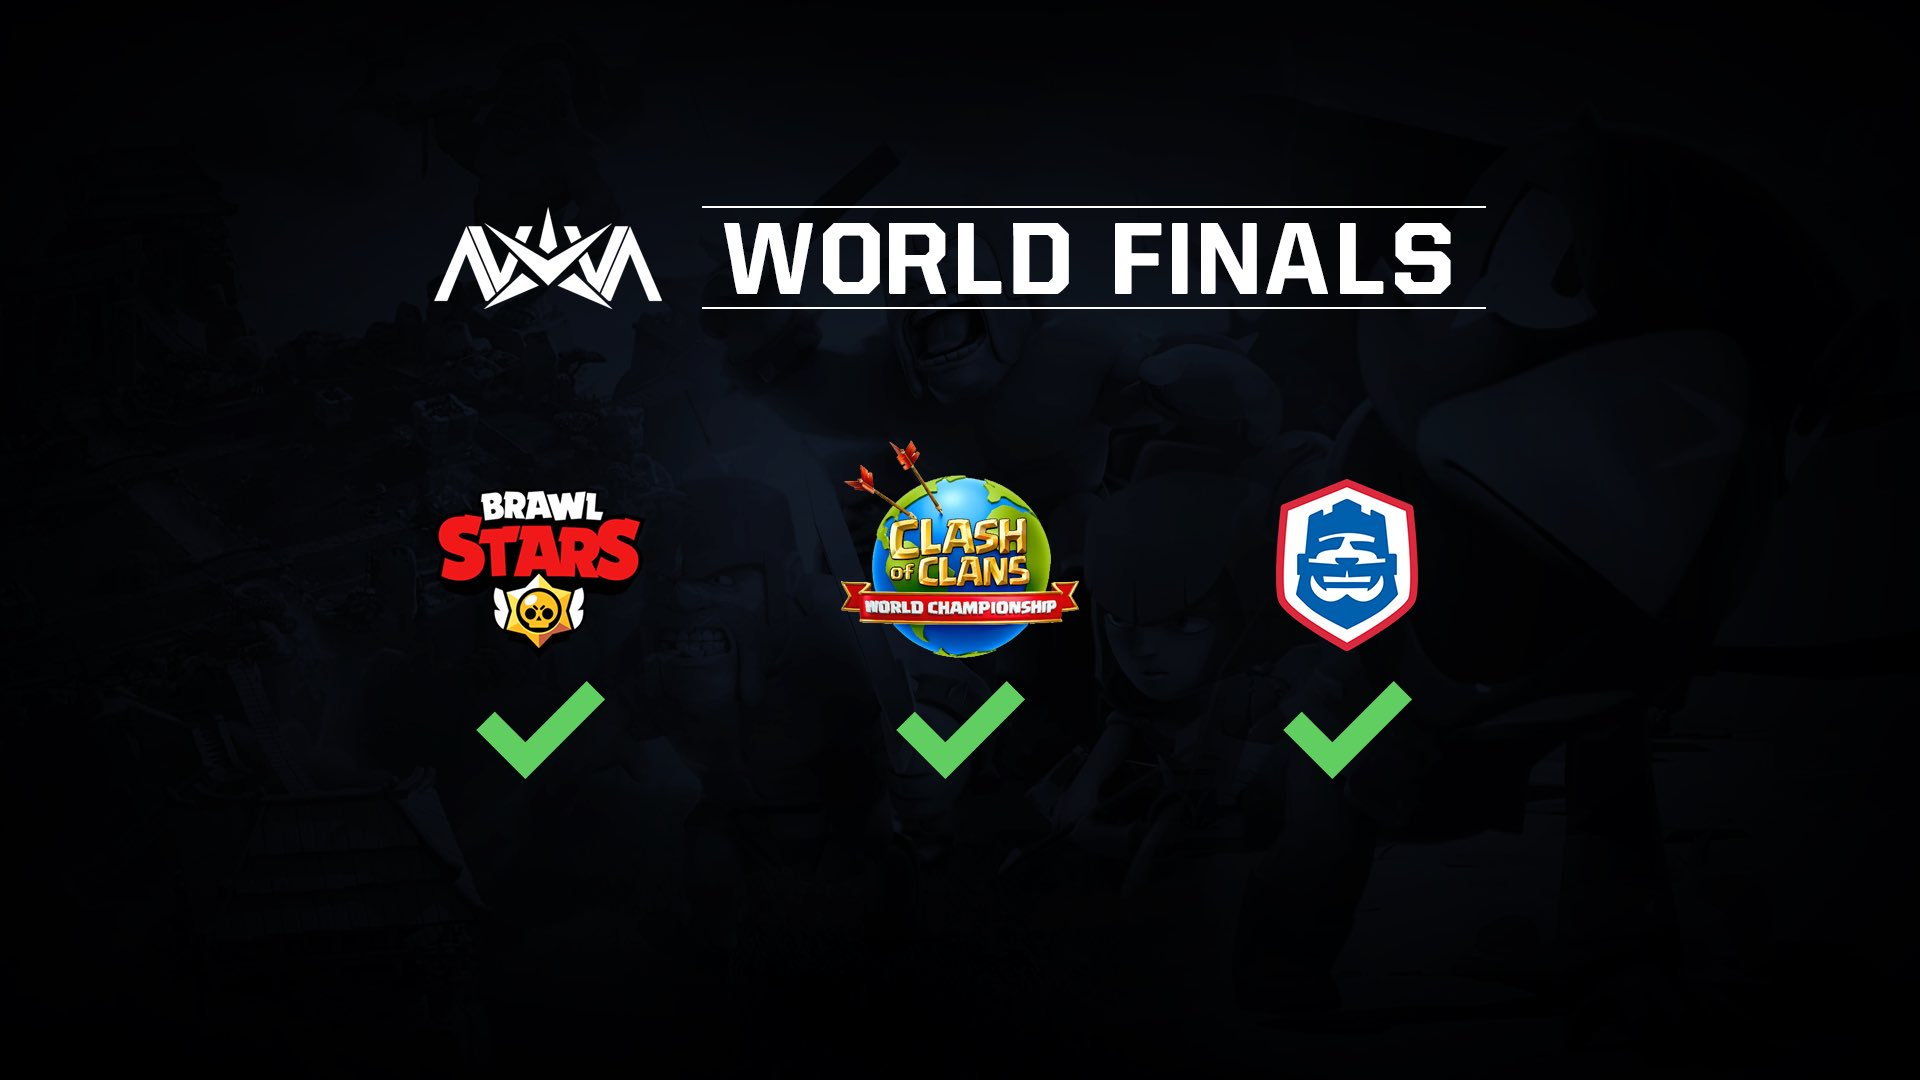 Mondiali firmati Supercell: triplete dei Nova Esports